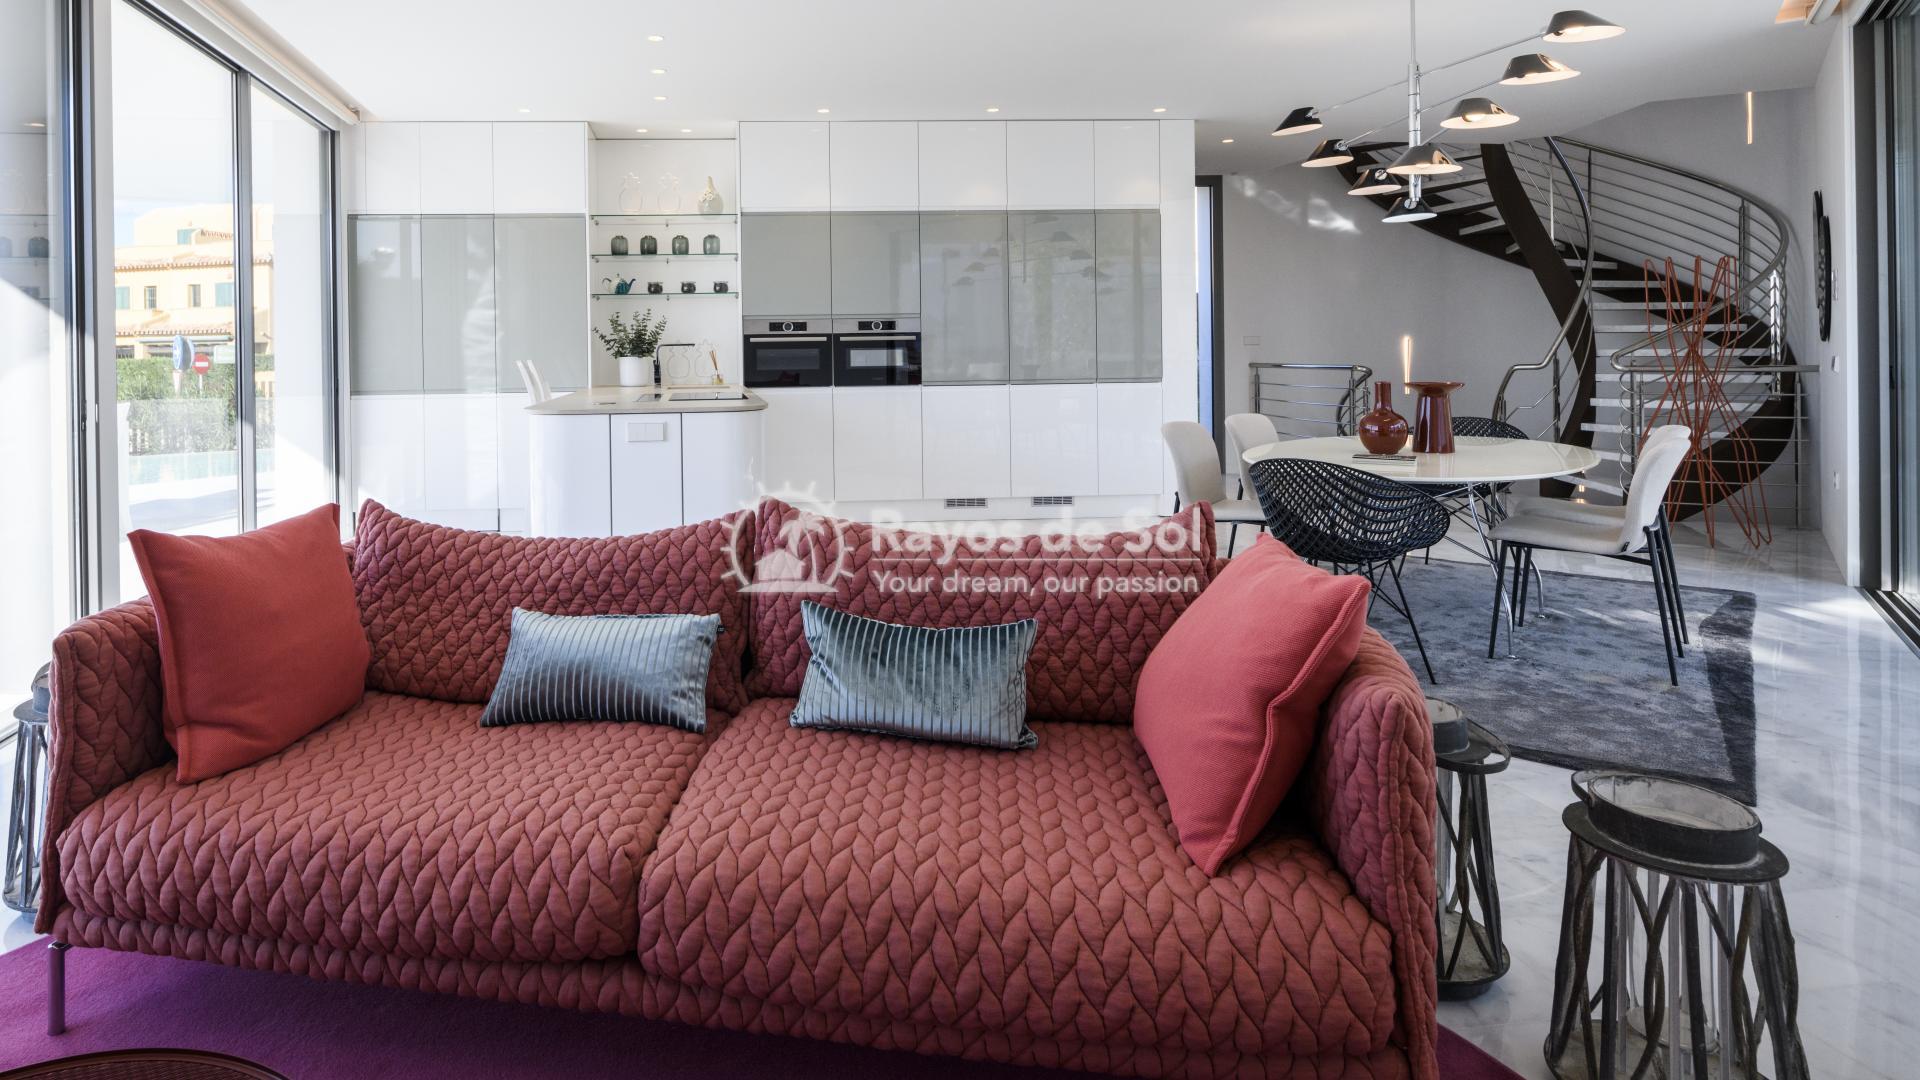 Stunning modern design villa  in Sierra Cortina, Finestrat, Costa Blanca (Praga 19) - 8